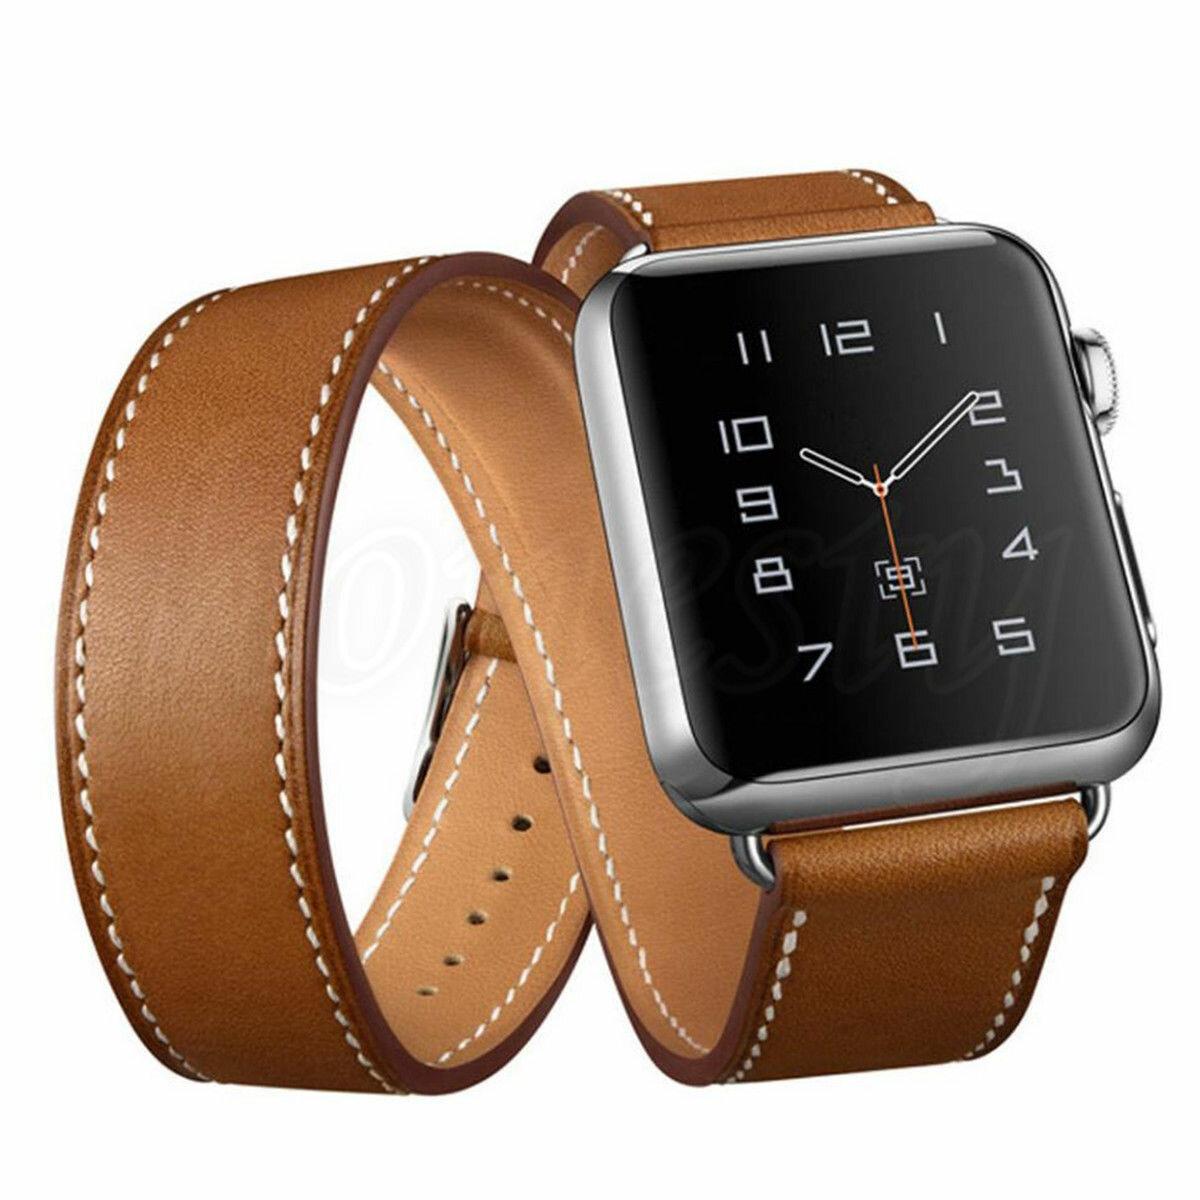 Piel Genuina Reloj Banda Reemplazo de correa para Apple Watch Serie 1 42 mm